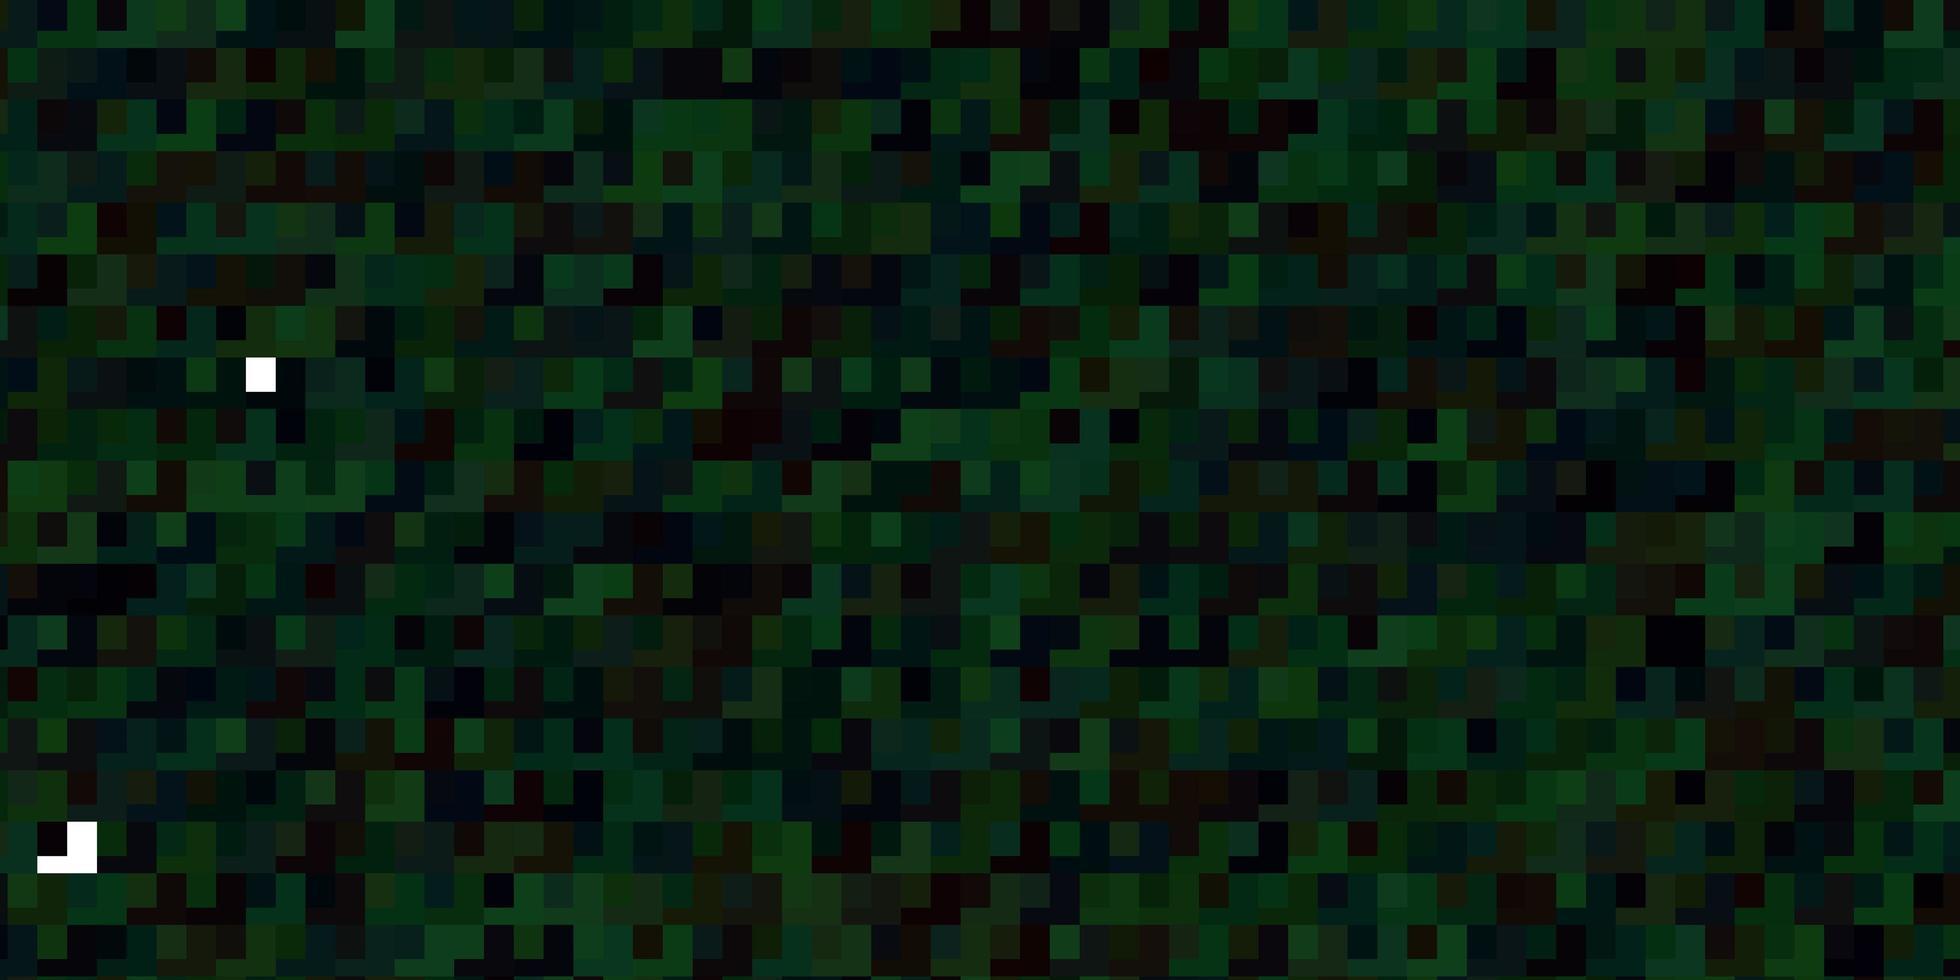 fondo verde en estilo poligonal. vector